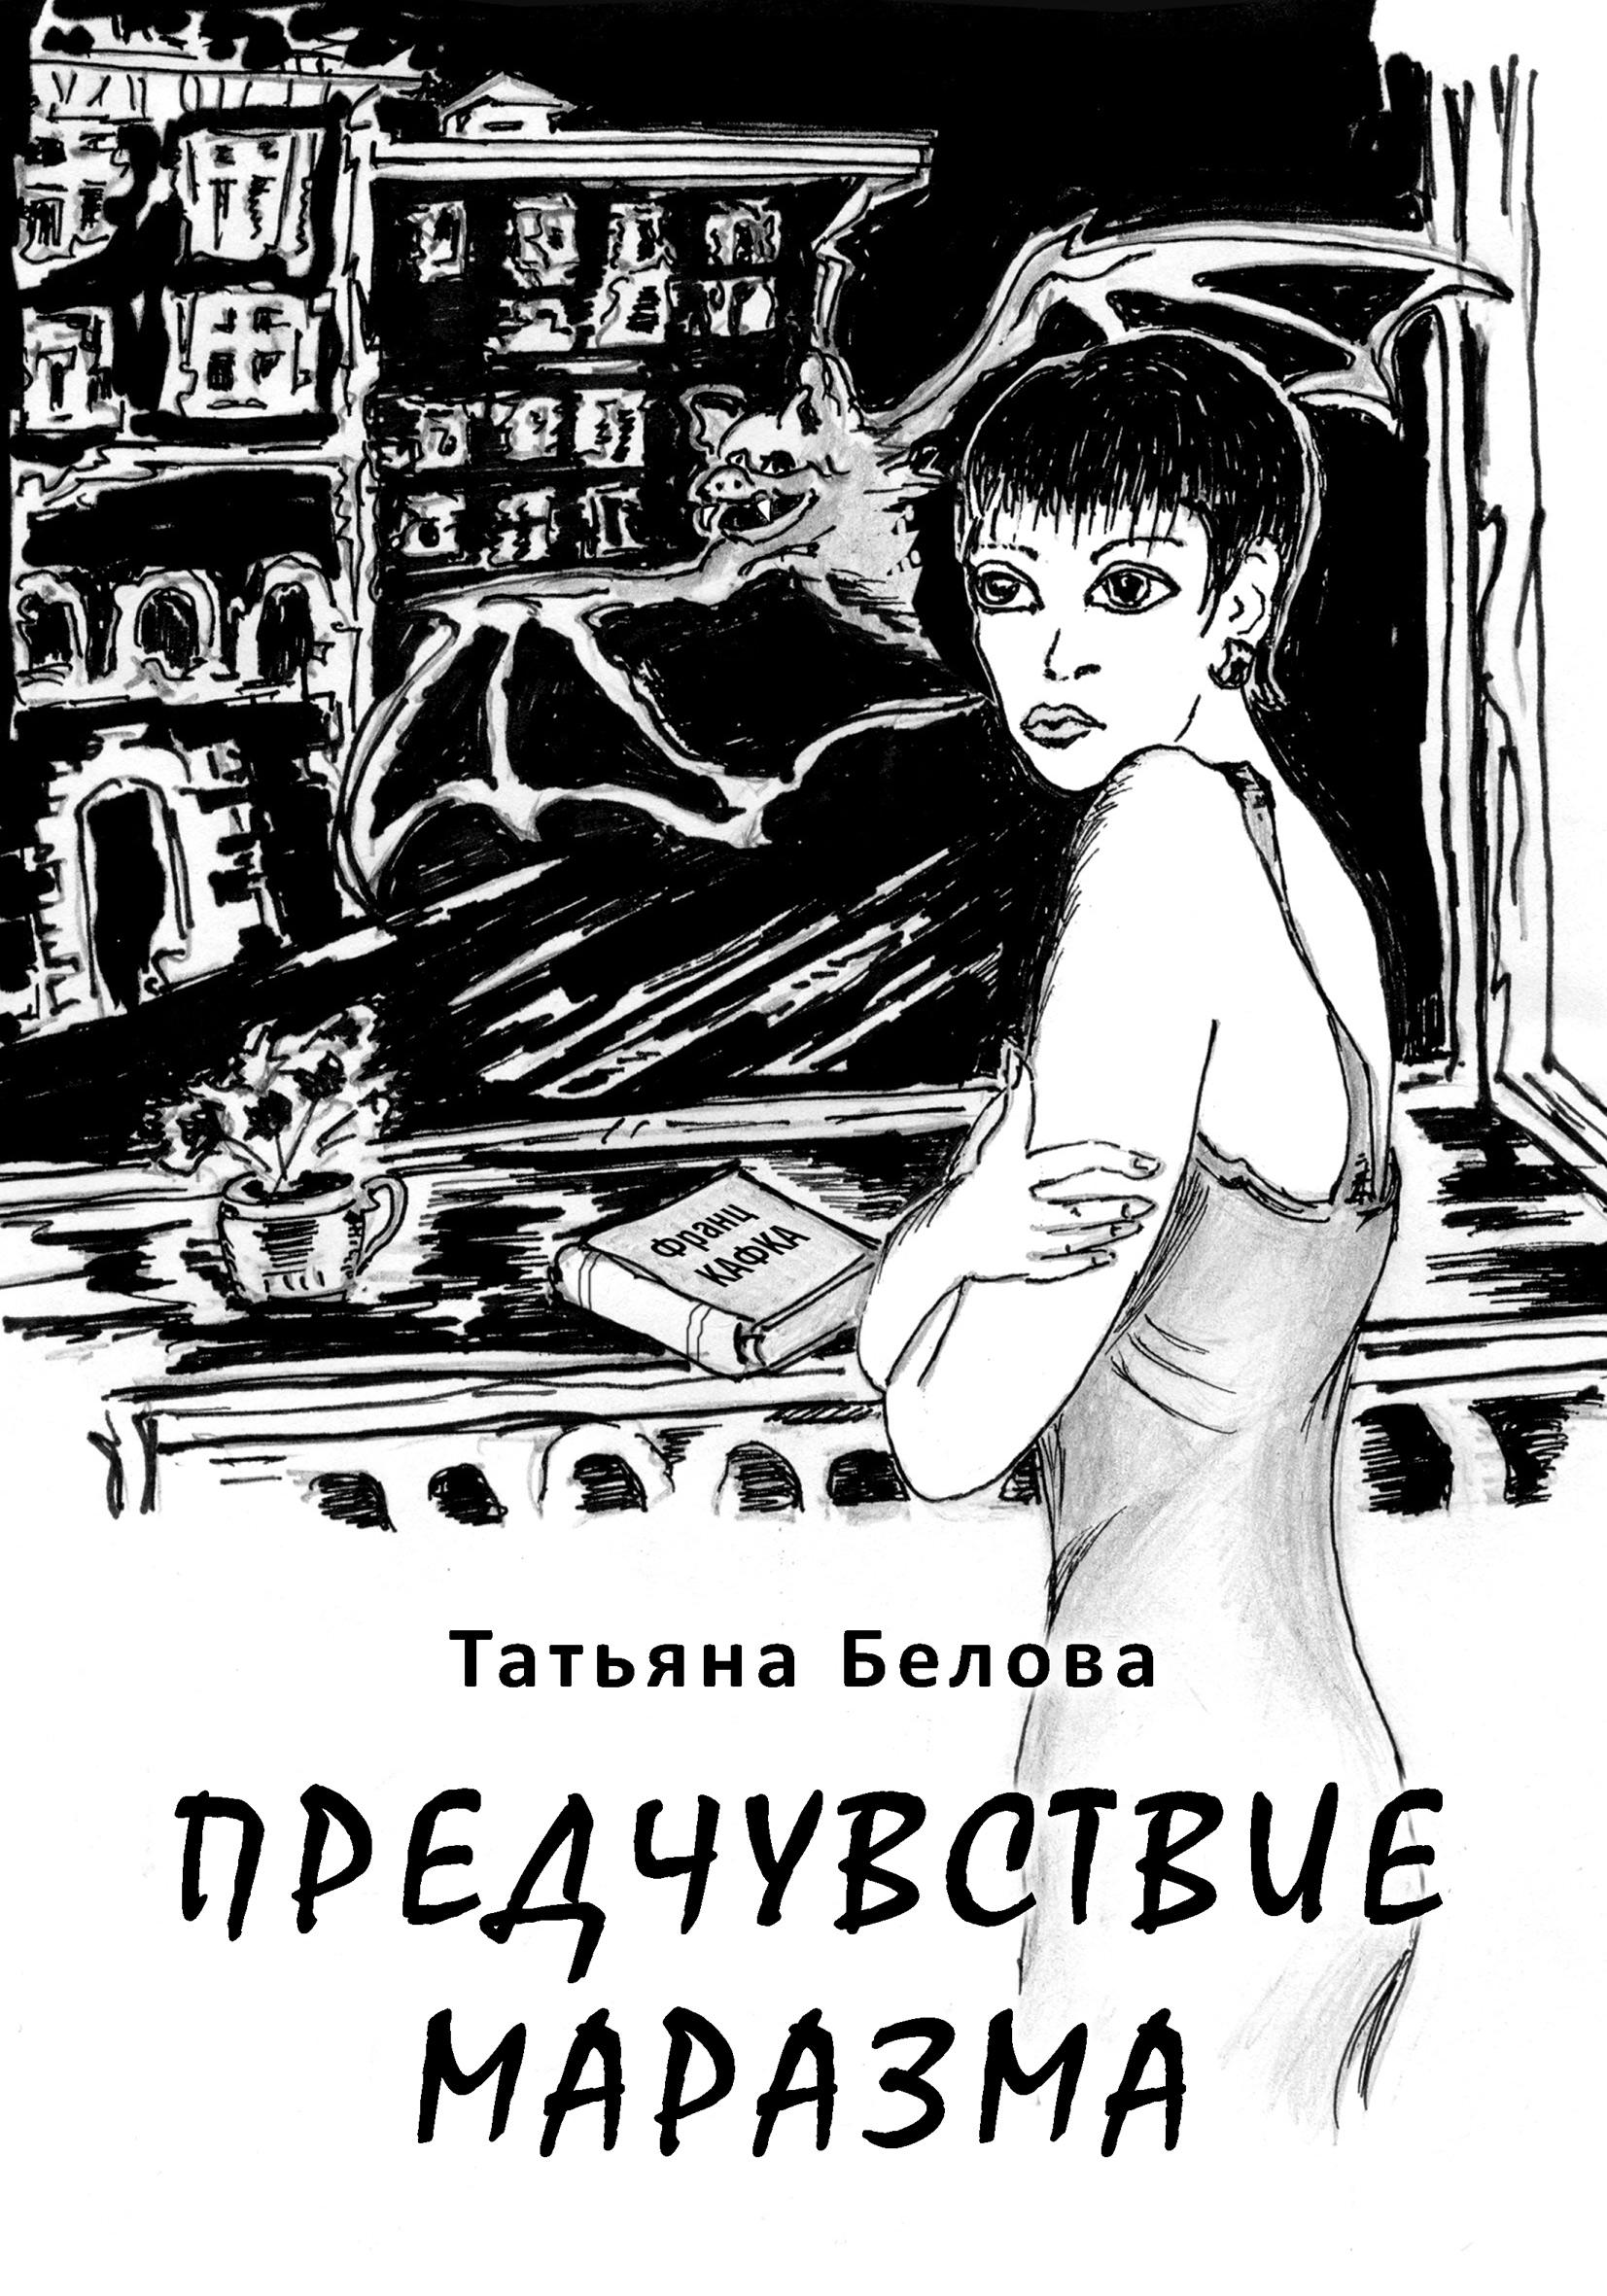 Татьяна Белова Предчувствие маразма марина белова золото ночного будапешта